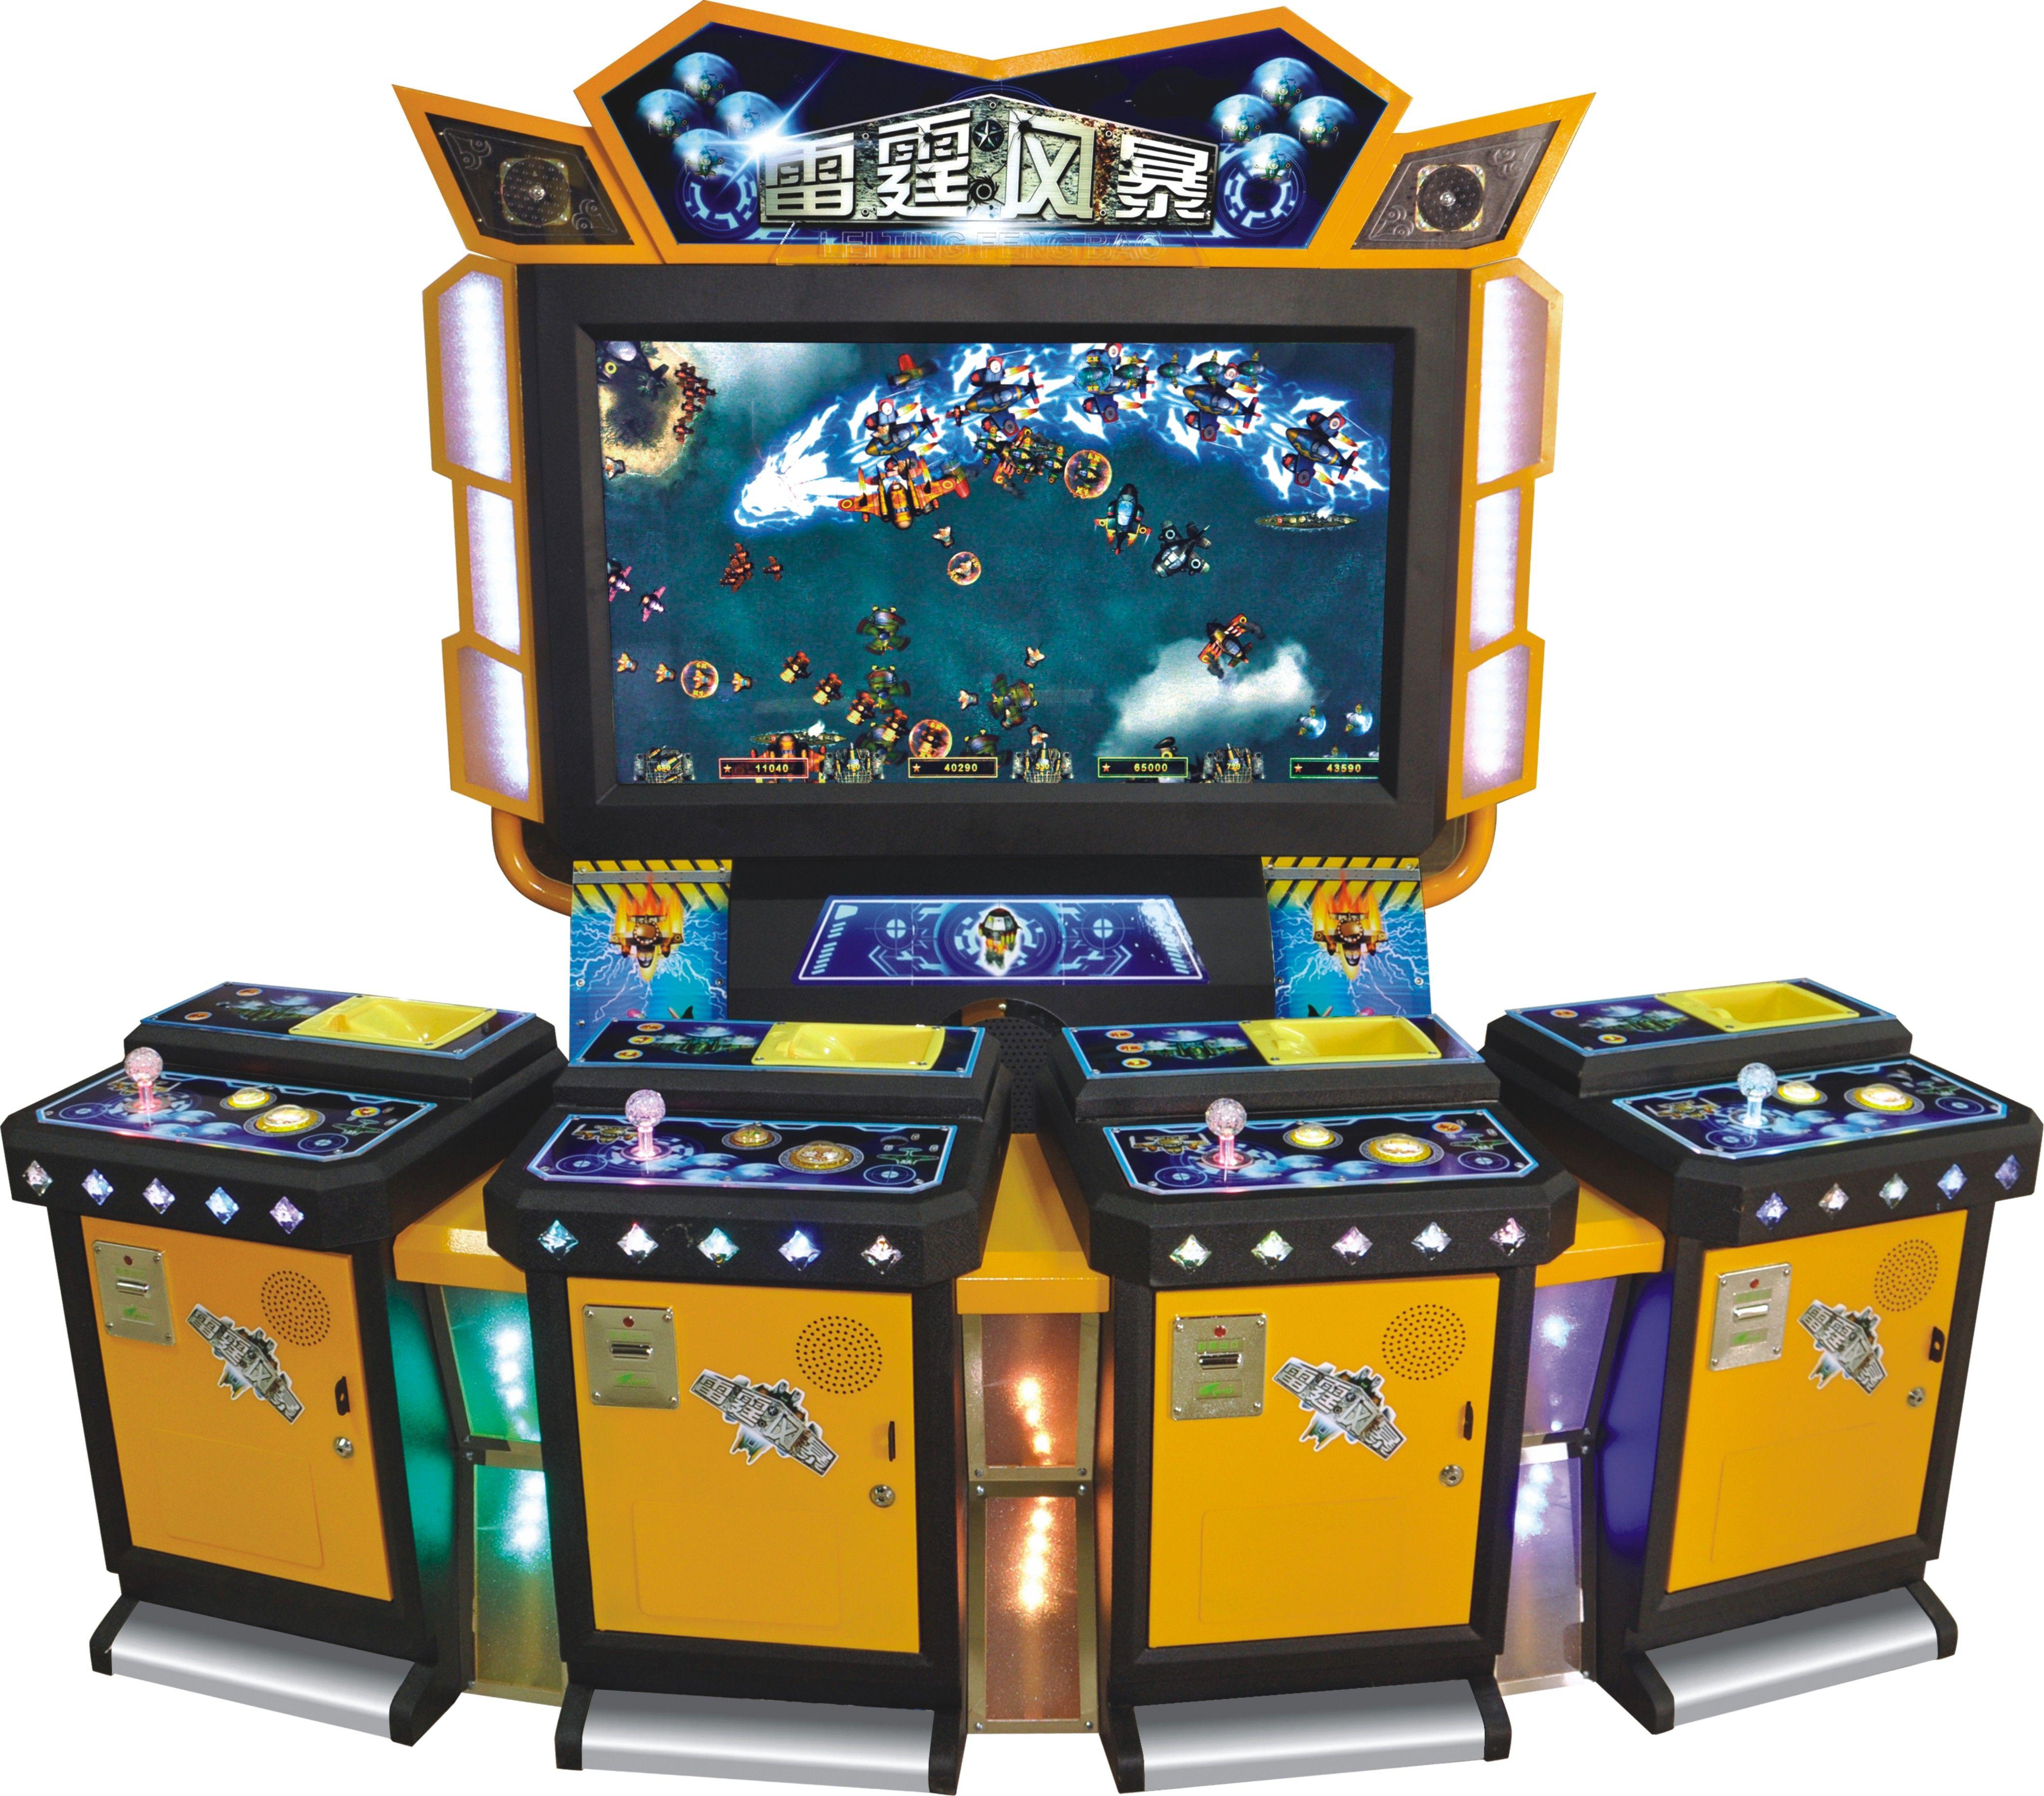 We are a fish game machine / skill game software developer